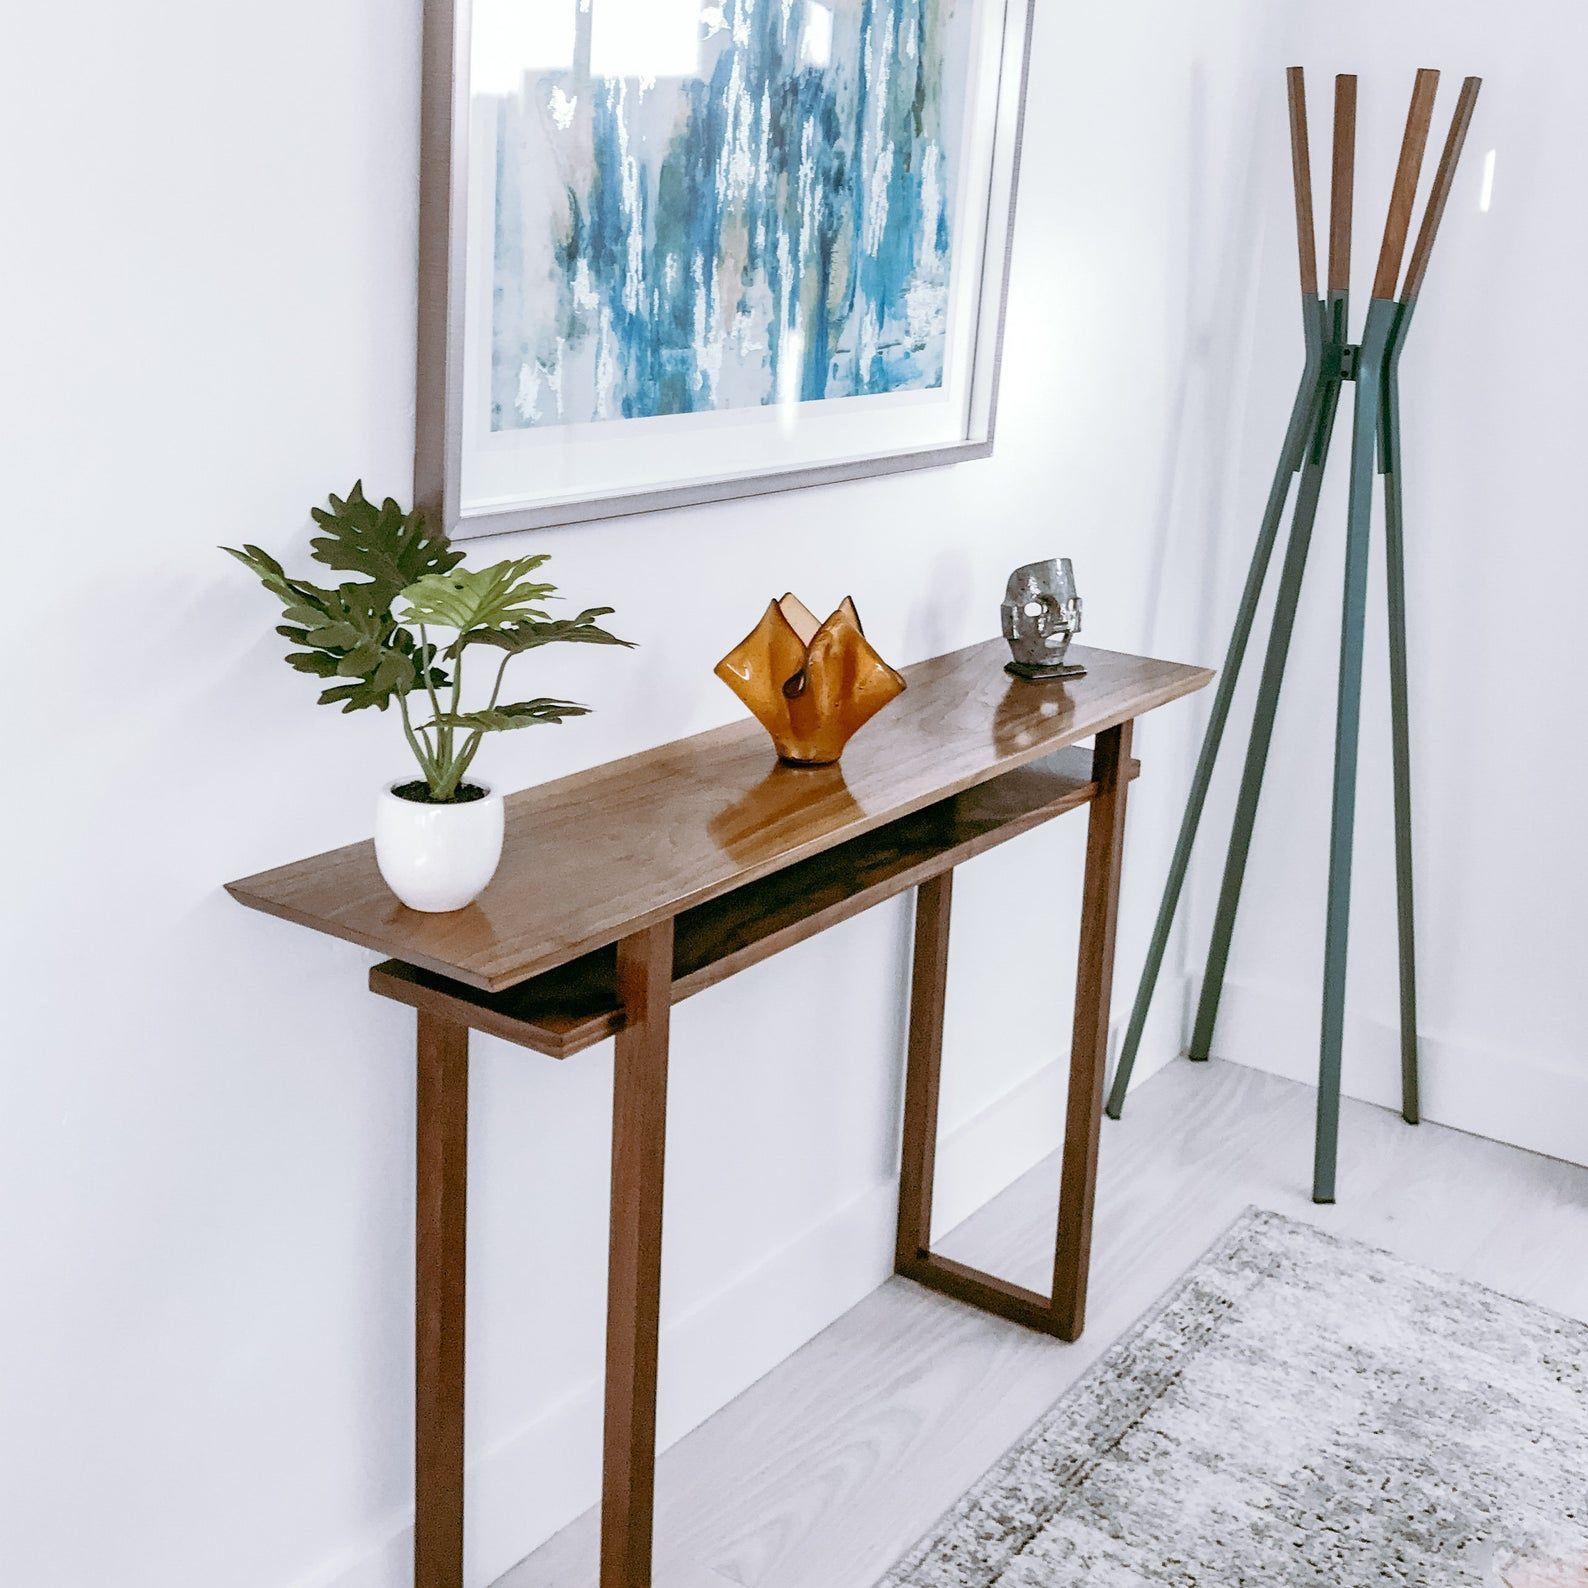 Modern Wood Narrow Hallway Table Narrow Console Table Side Etsy In 2021 Narrow Console Table Classic Console Table Entry Console Table